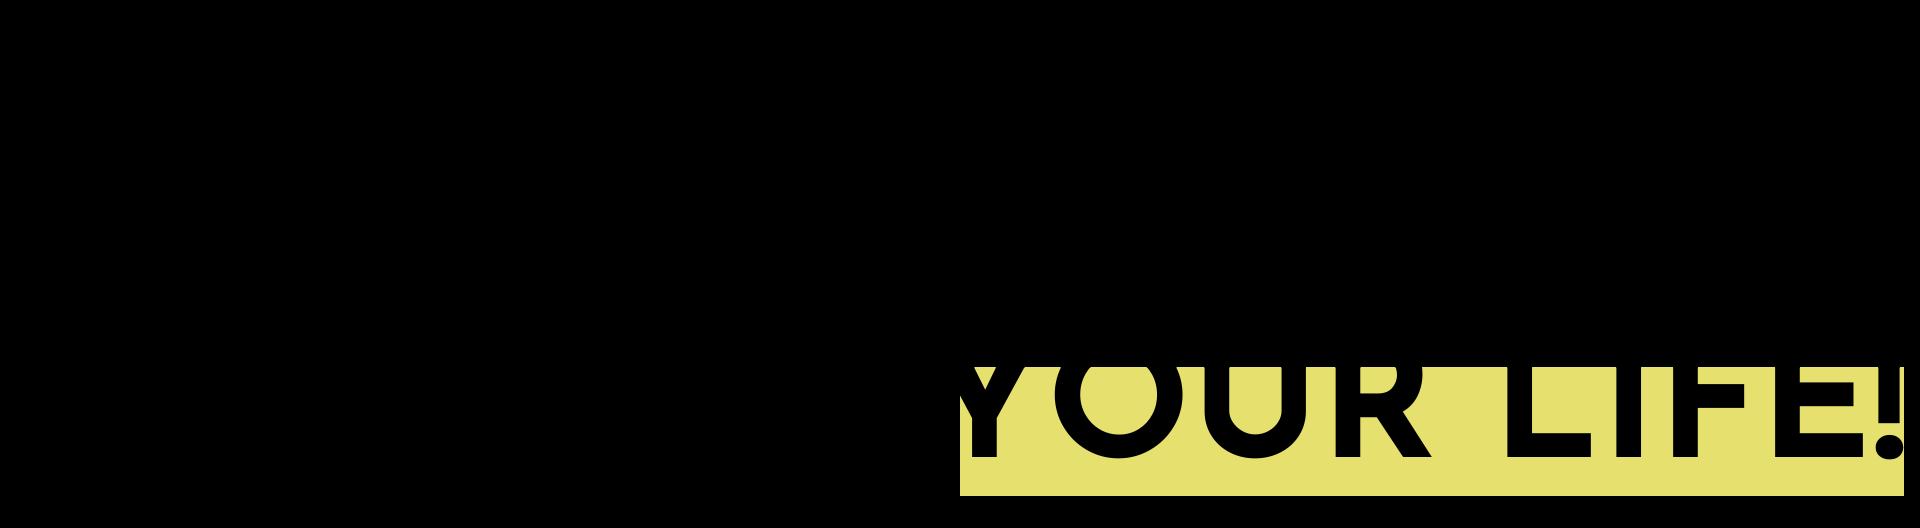 Unleash Your Life (29)